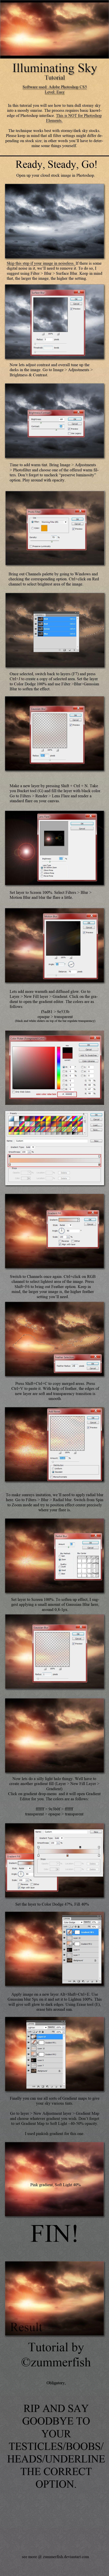 Illuminating Sky (tutorial) by =zummerfish on deviantART